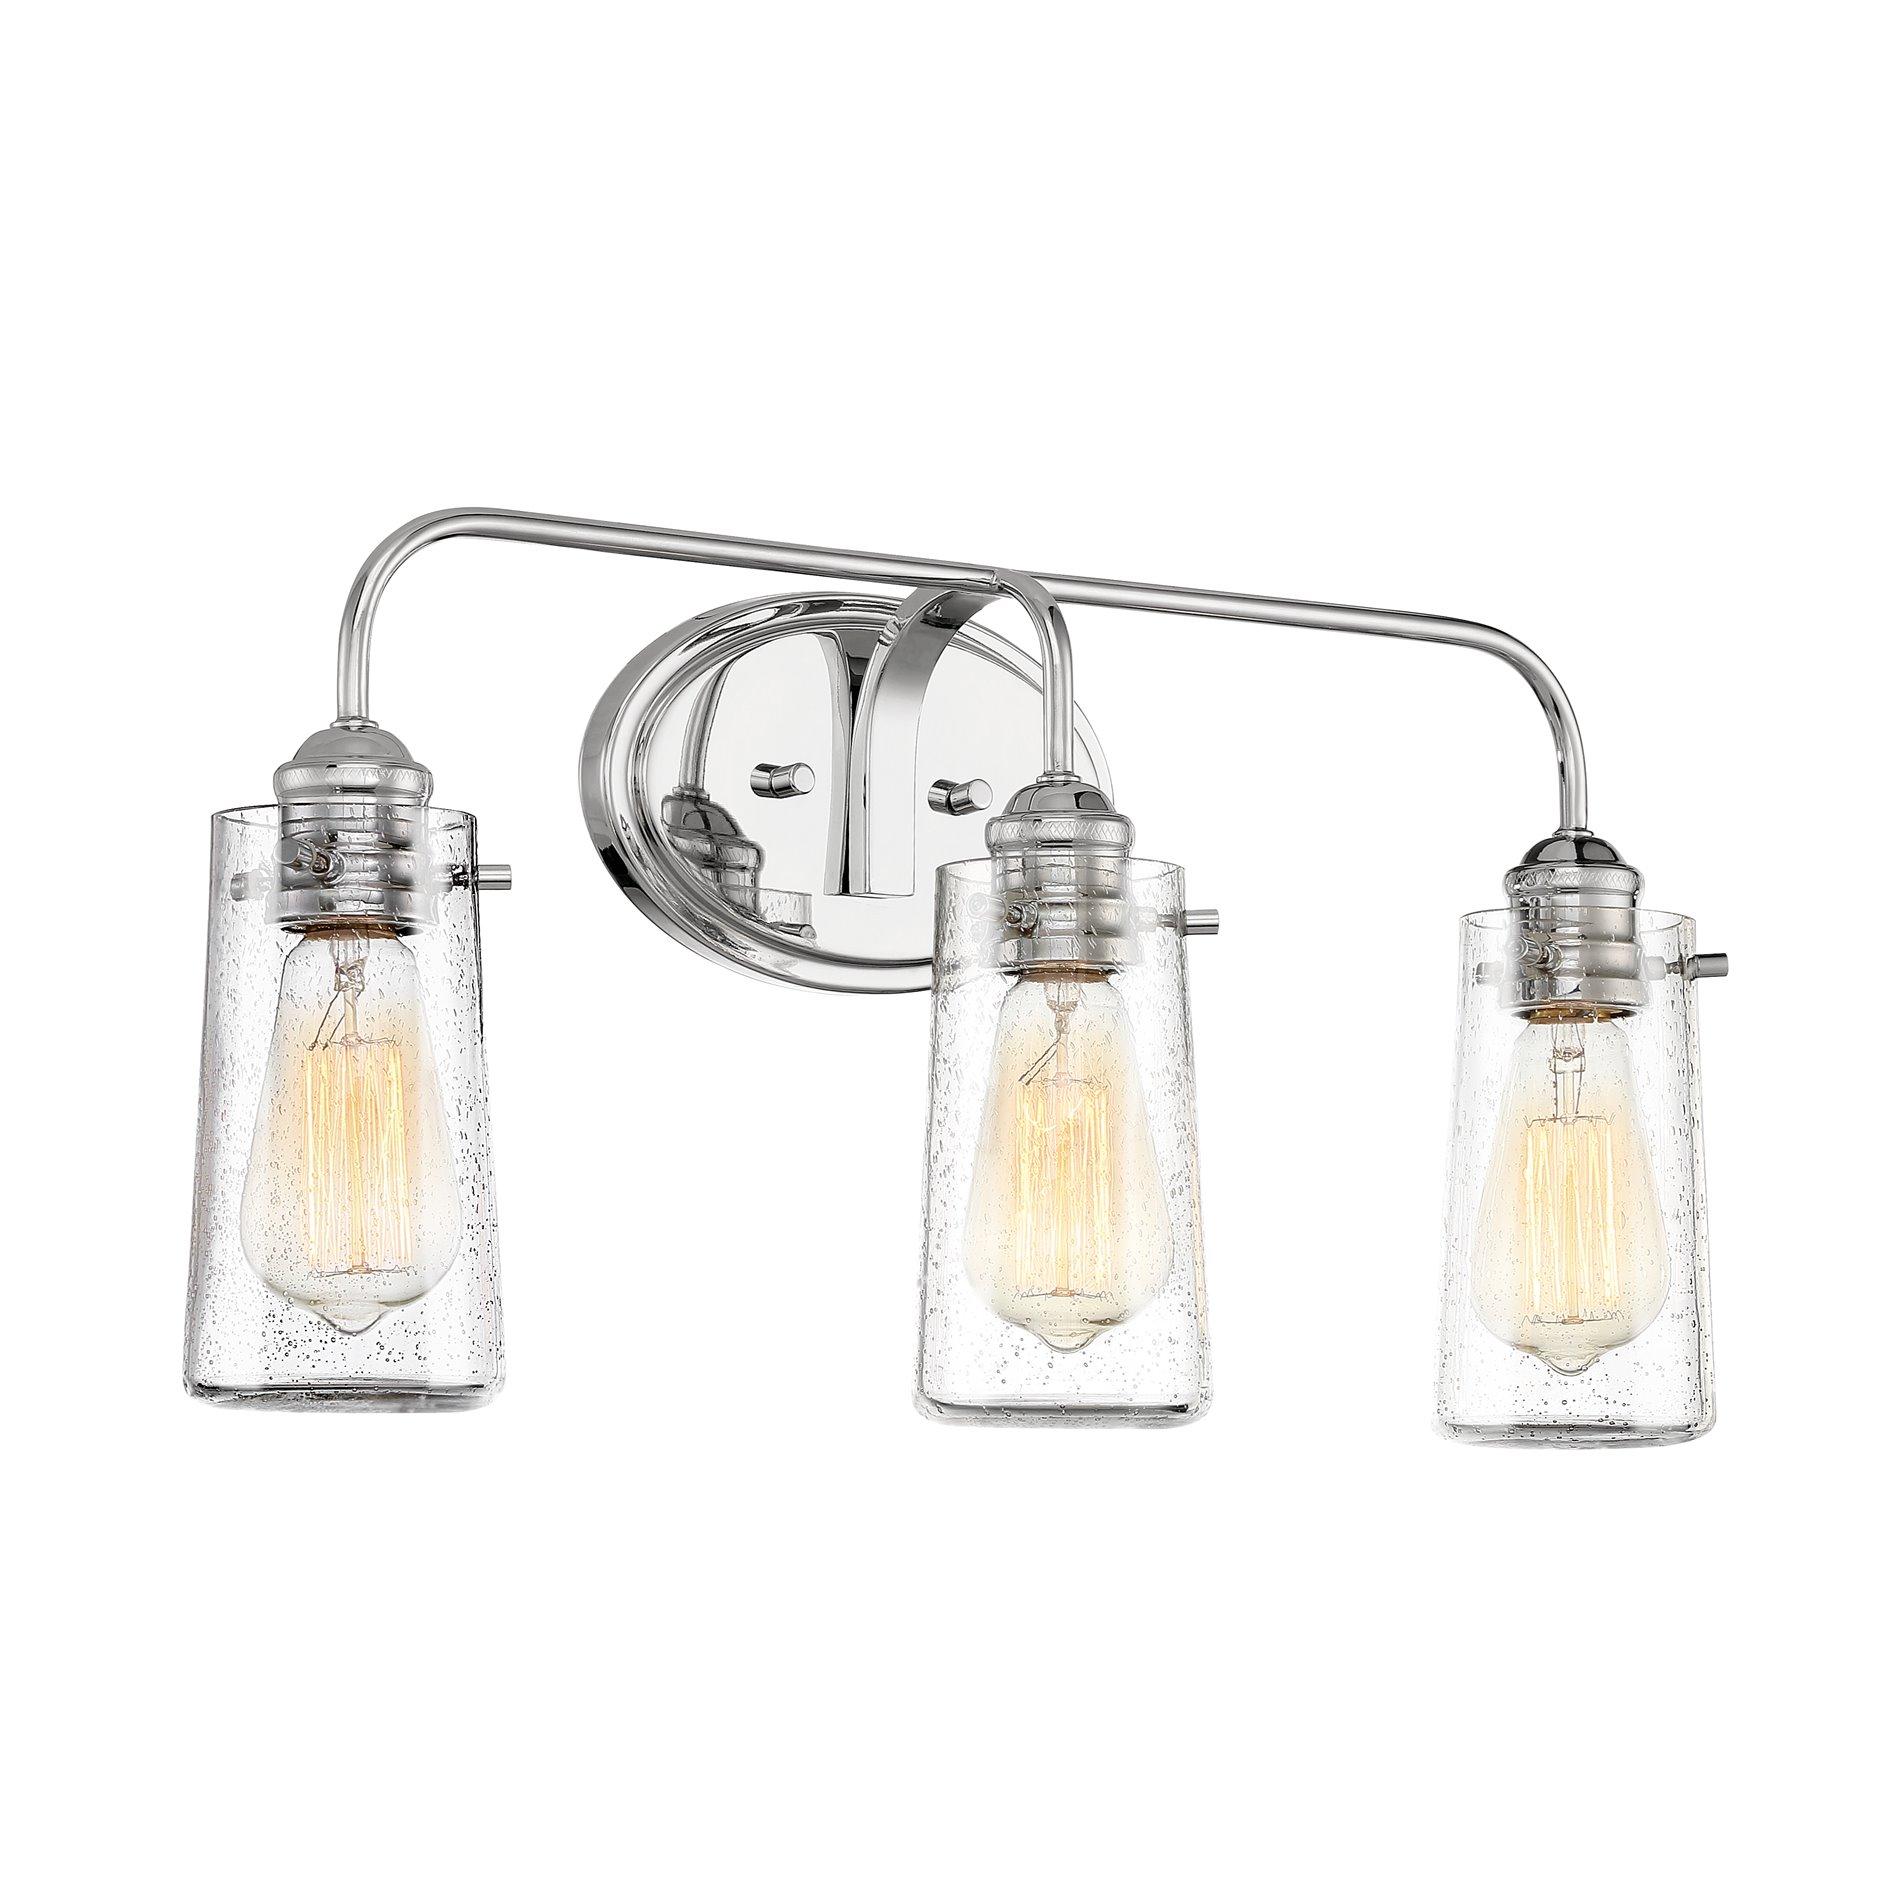 kira home rayne 22 5 modern farmhouse 3 light vanity bathroom light seeded glass shades chrome finish